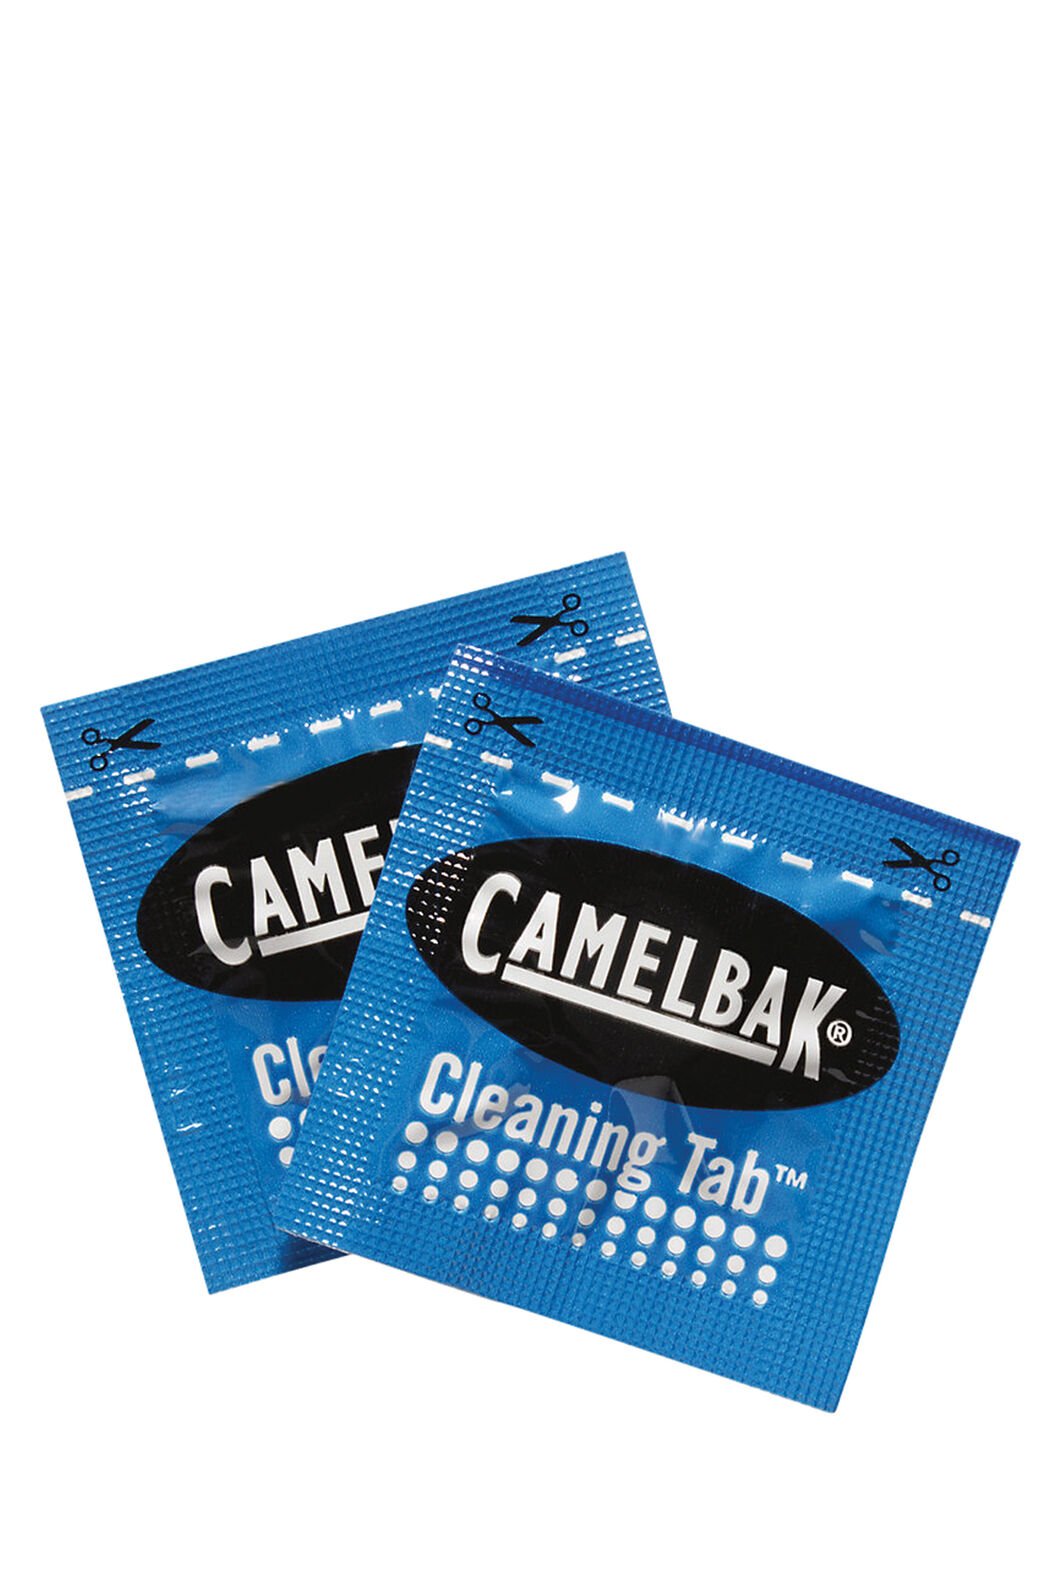 Camelbak 8 Pack Drink Bottle Cleaning Tablets, None, hi-res